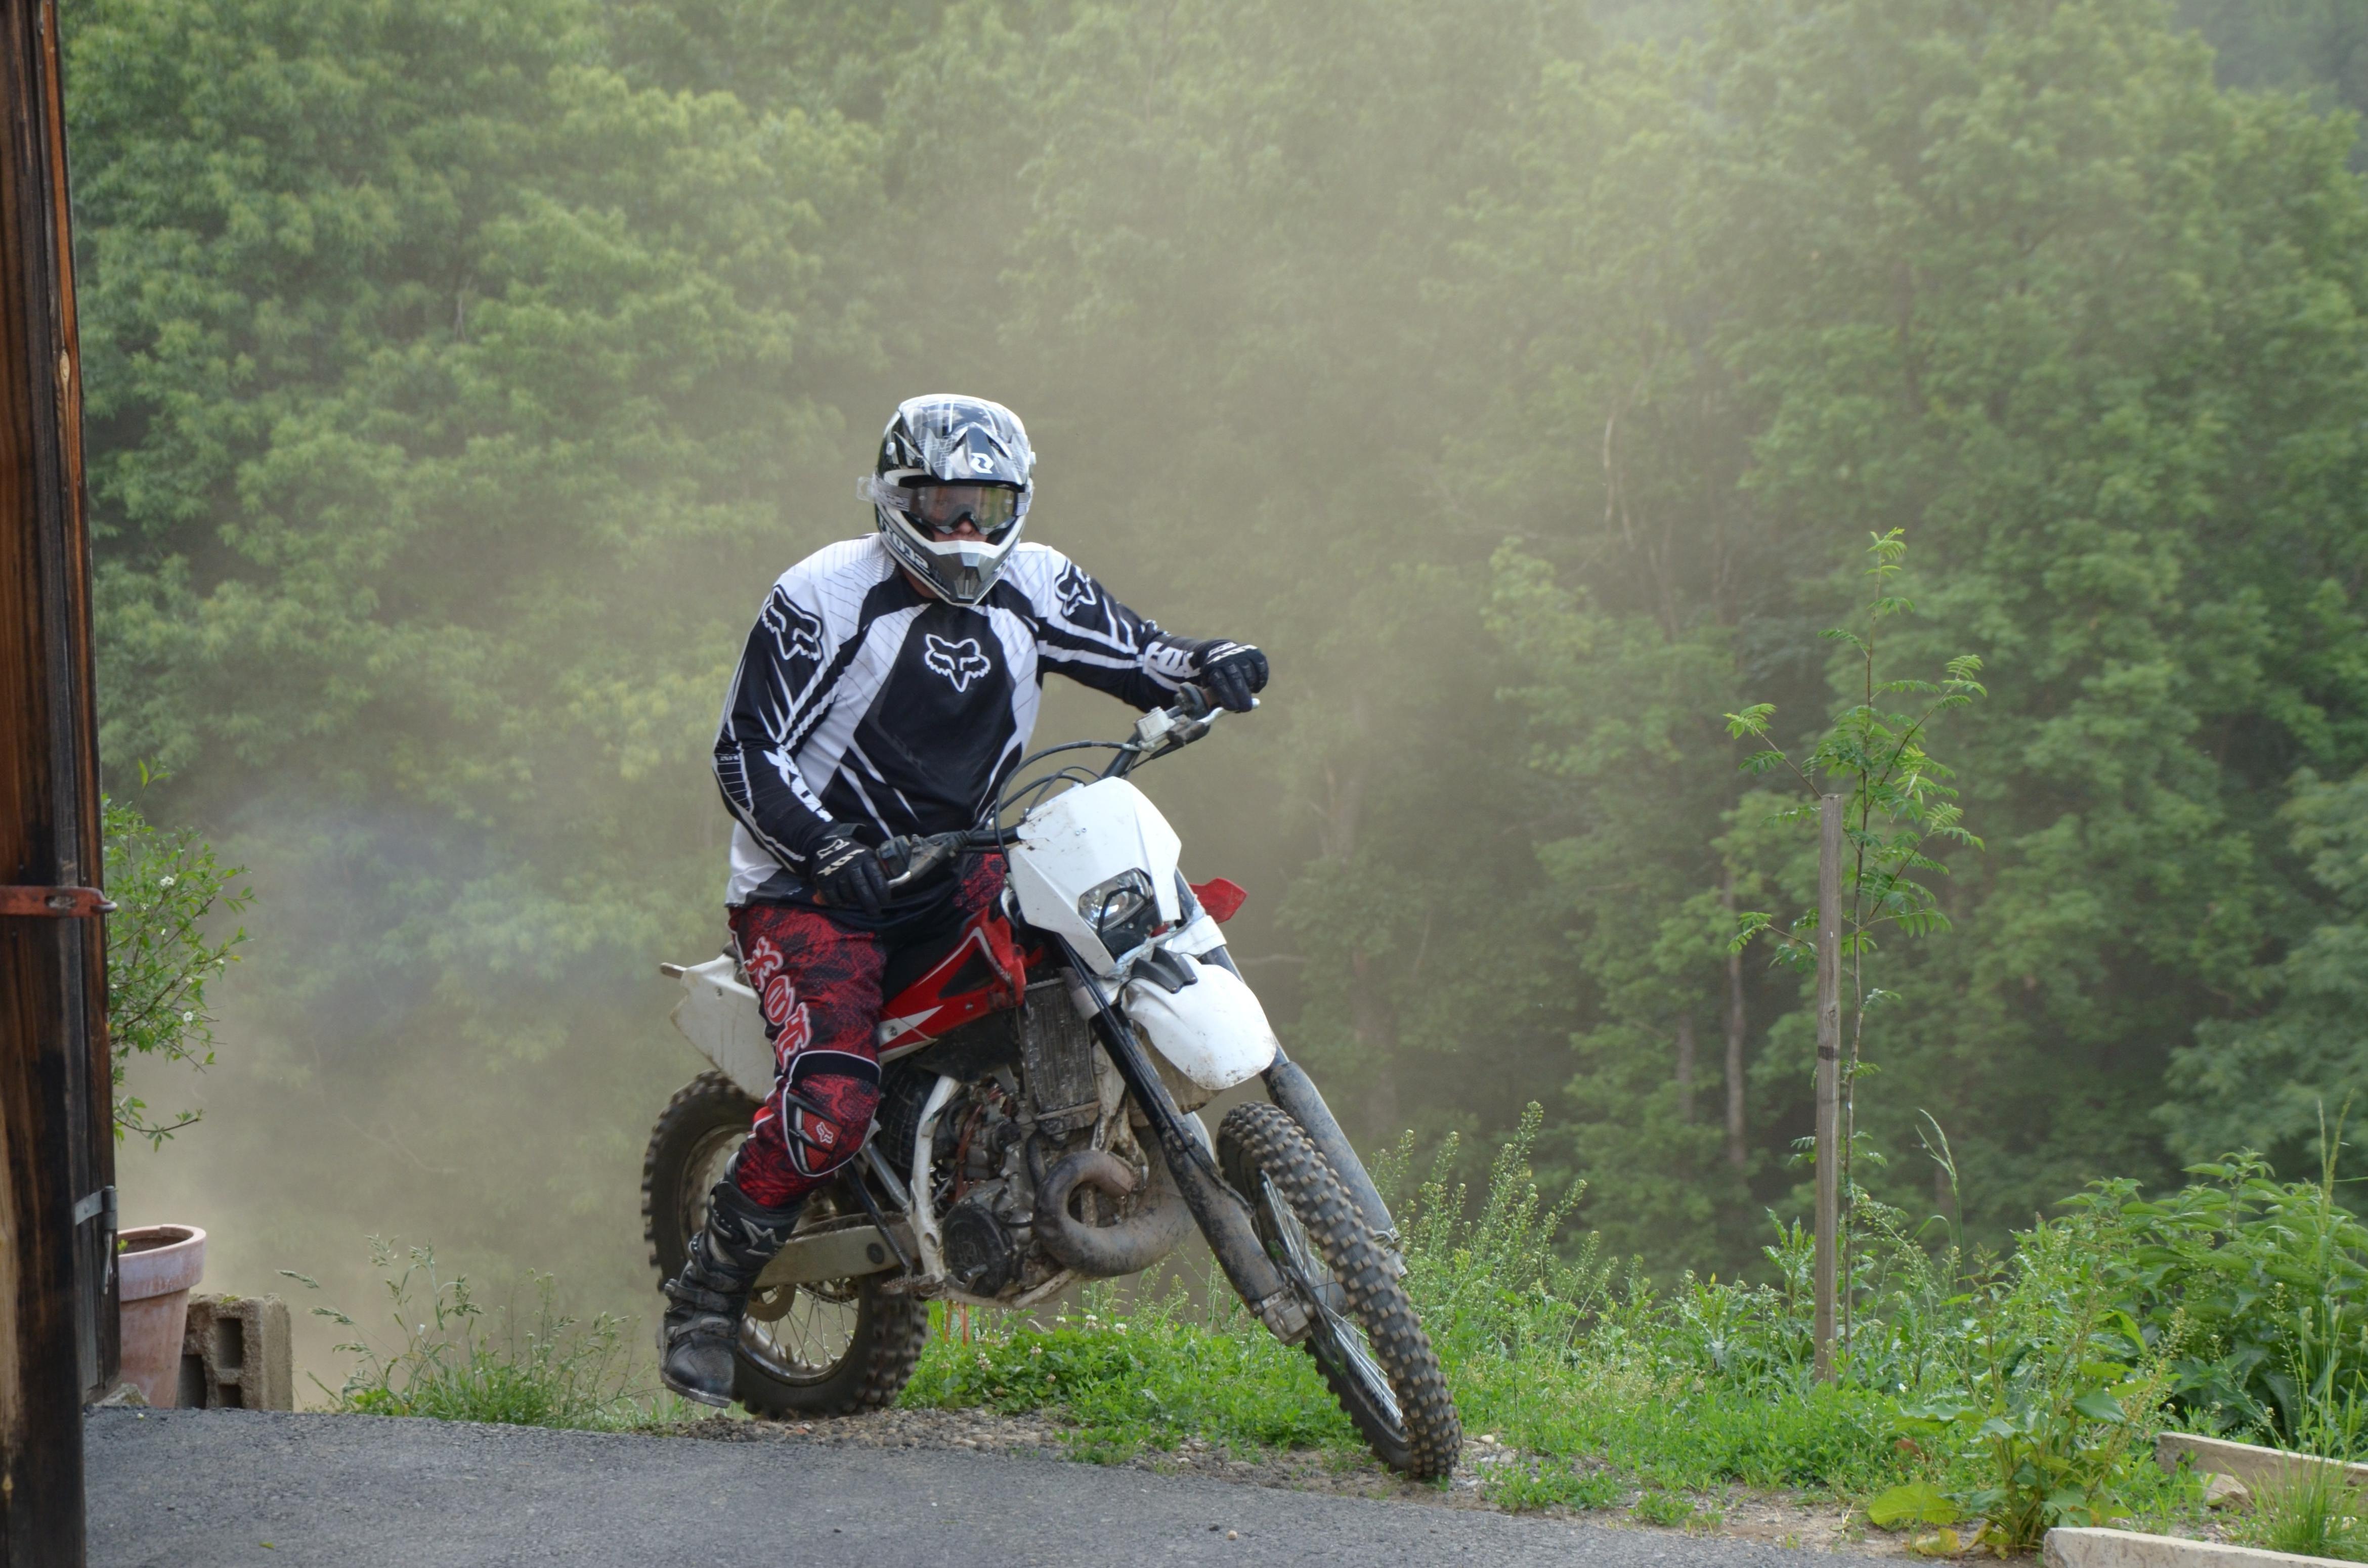 Image Libre Route Course Moto Motocross Sport Véhicules Casque